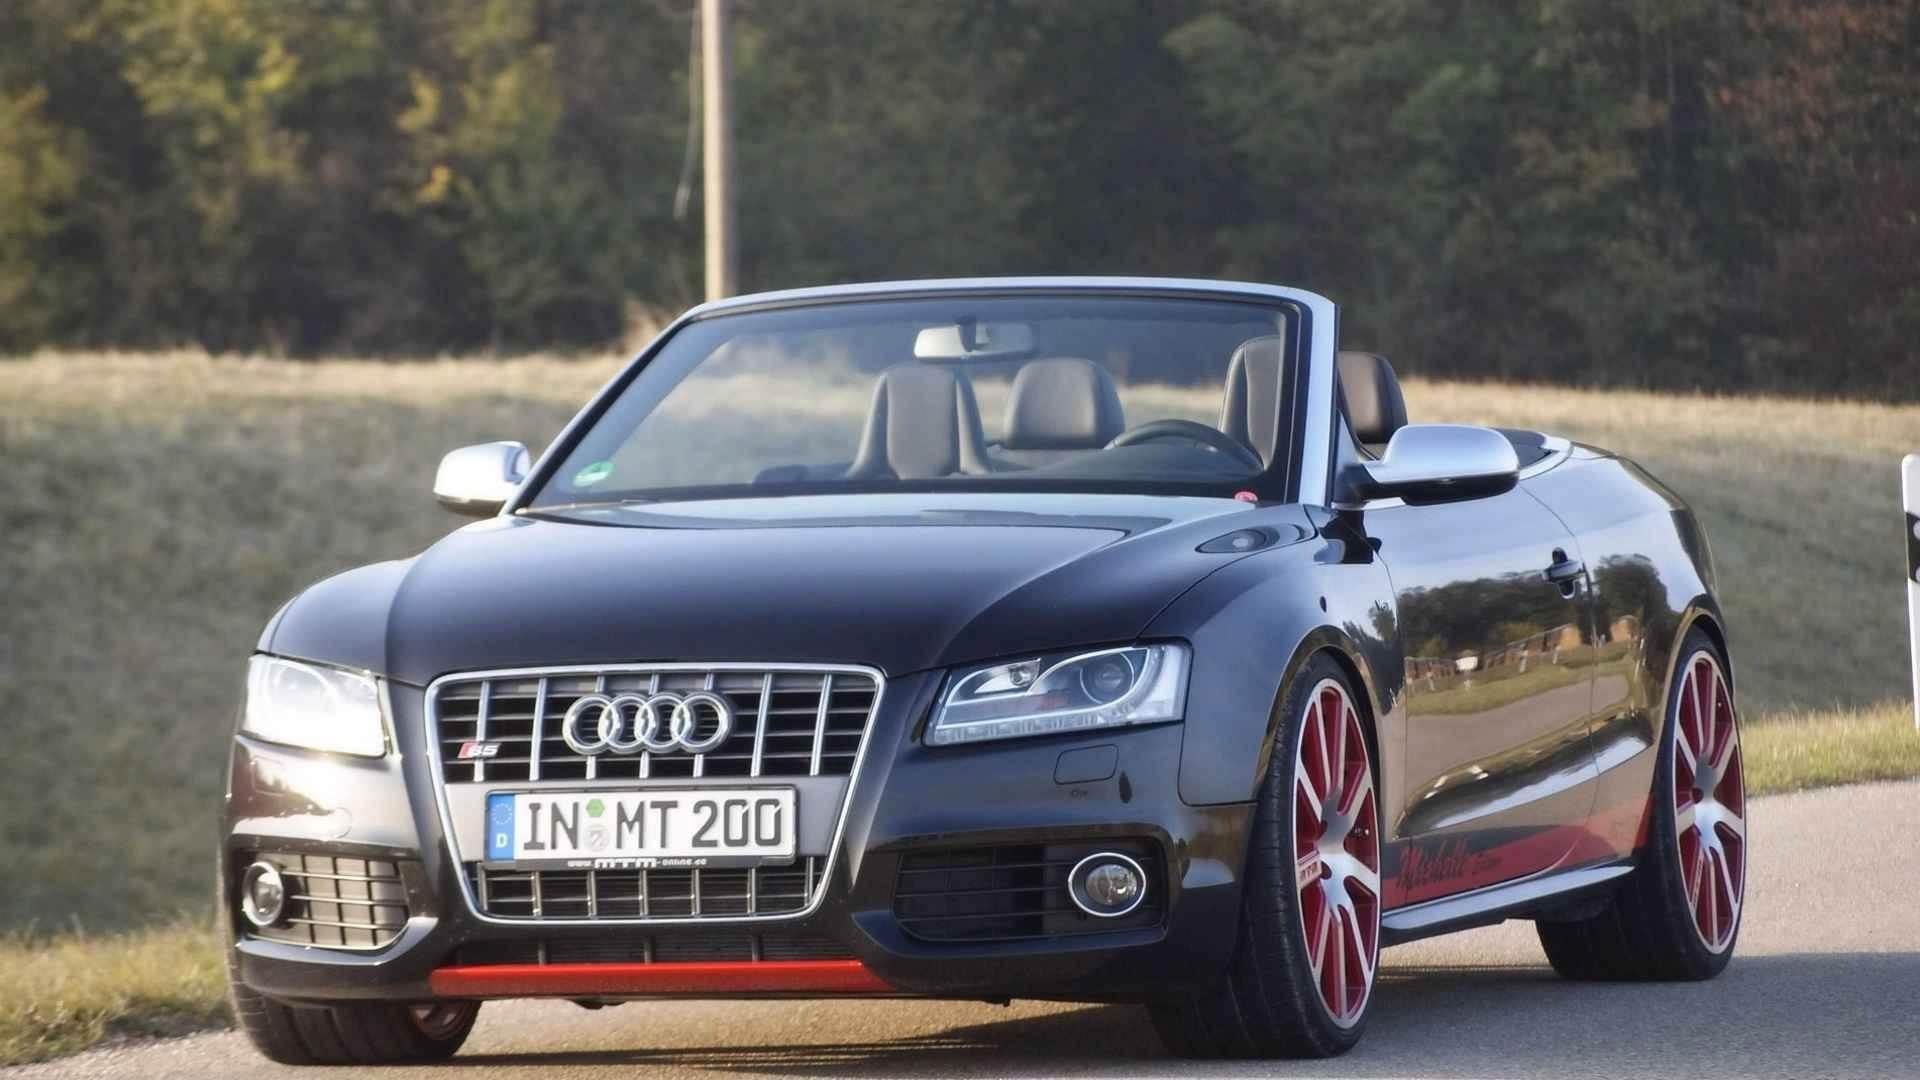 Audi Cars HD Wallpap